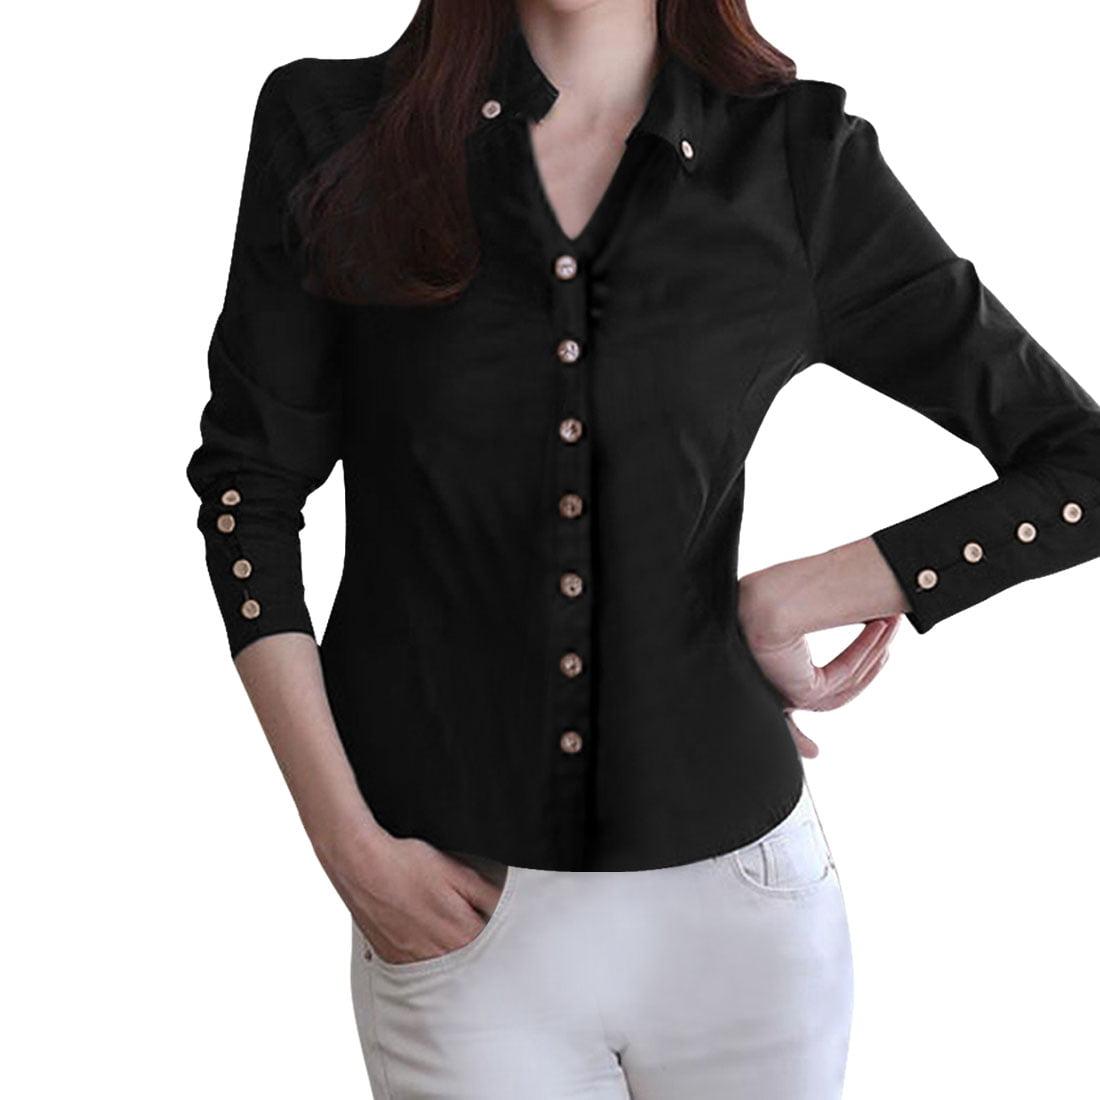 Womens Black Button Down Shirt Walmart